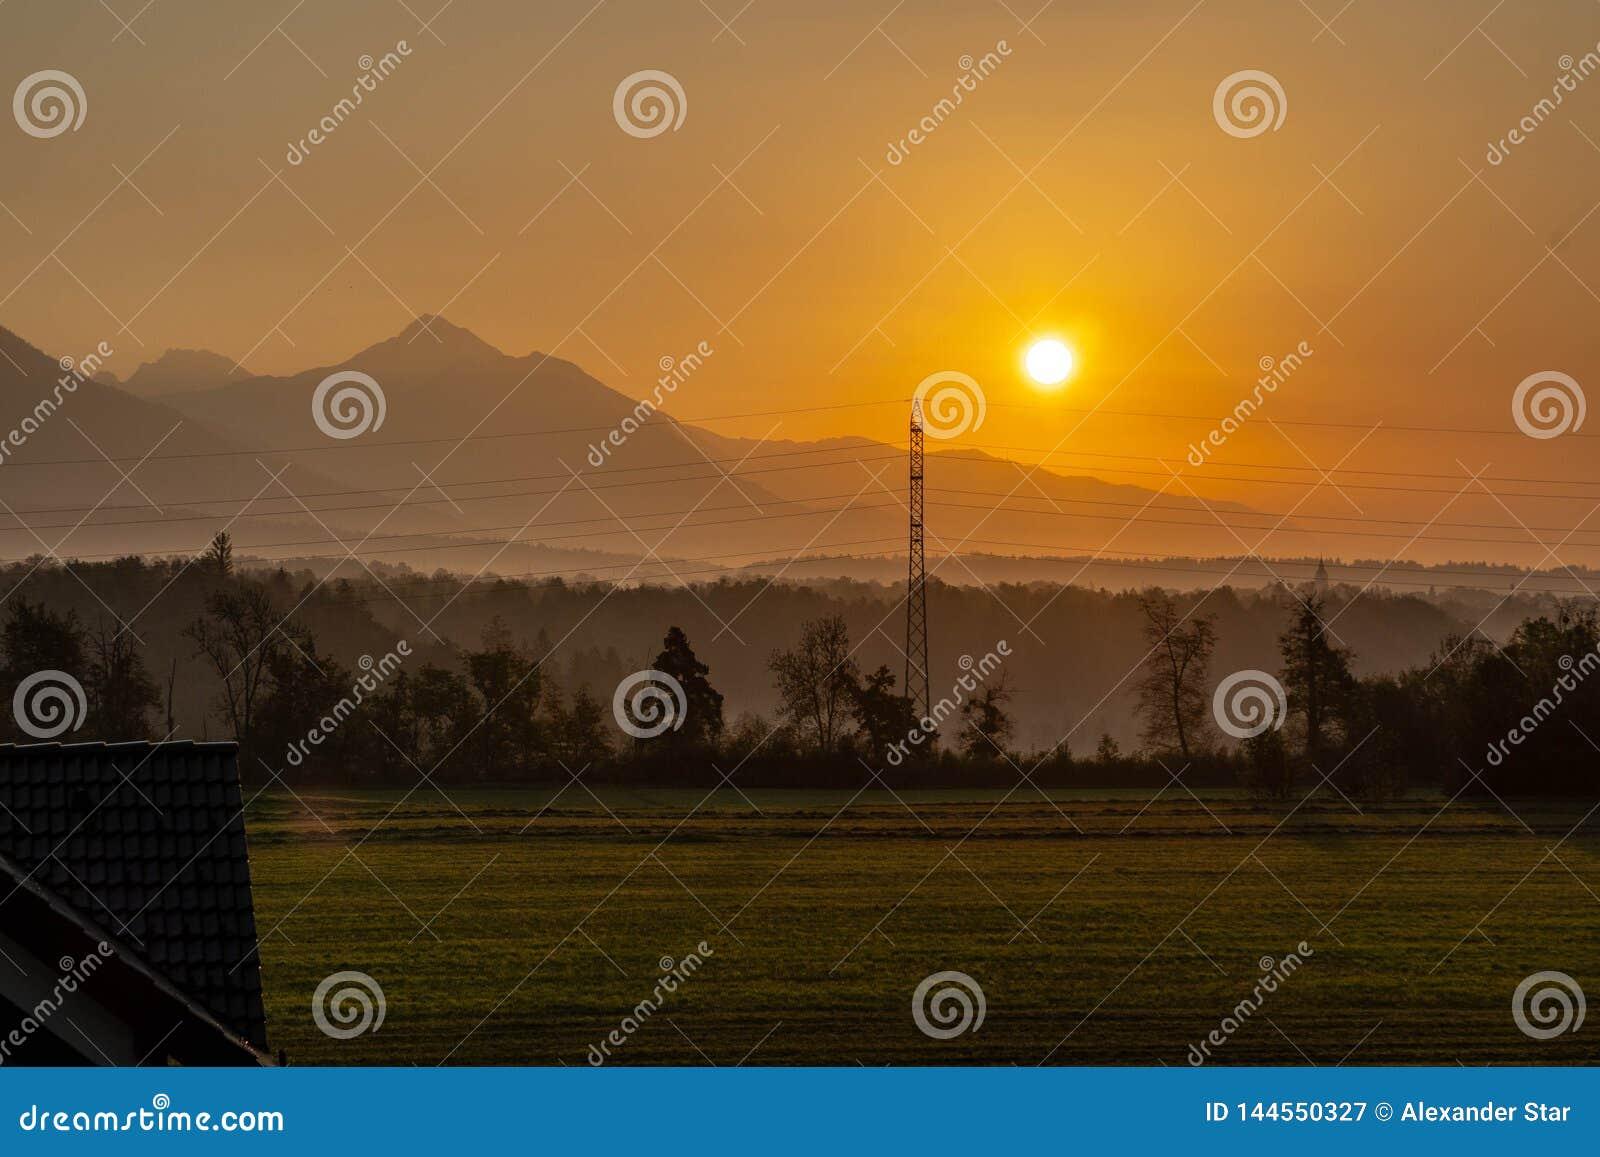 Восход солнца над лесом и горами